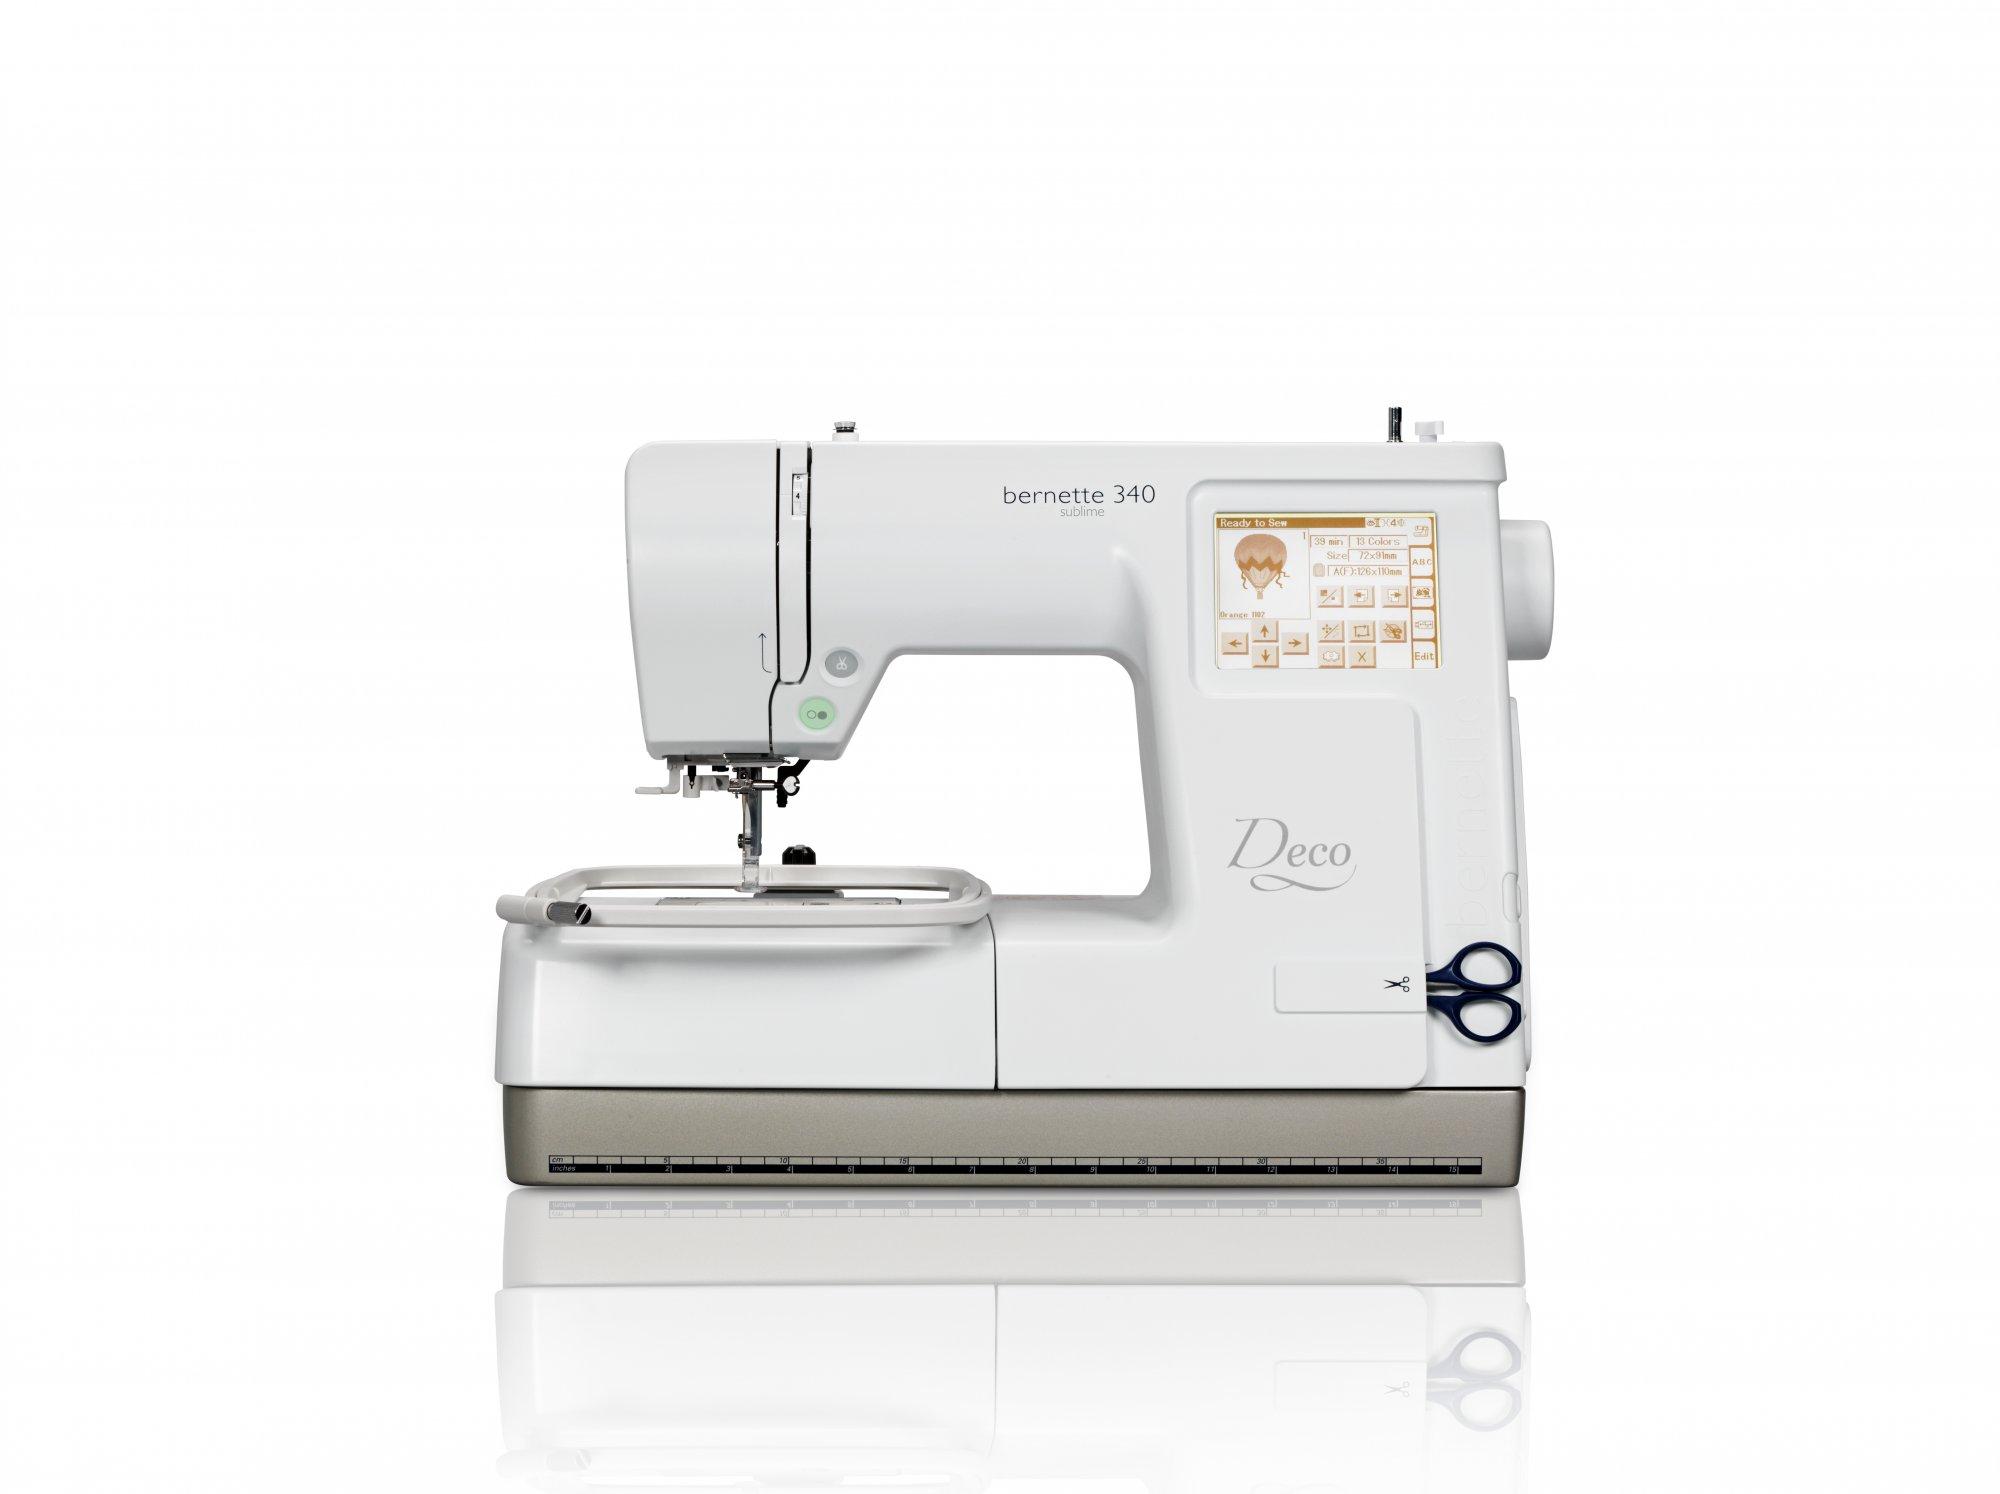 Bernette Deco 340 Emb Sewing Machine